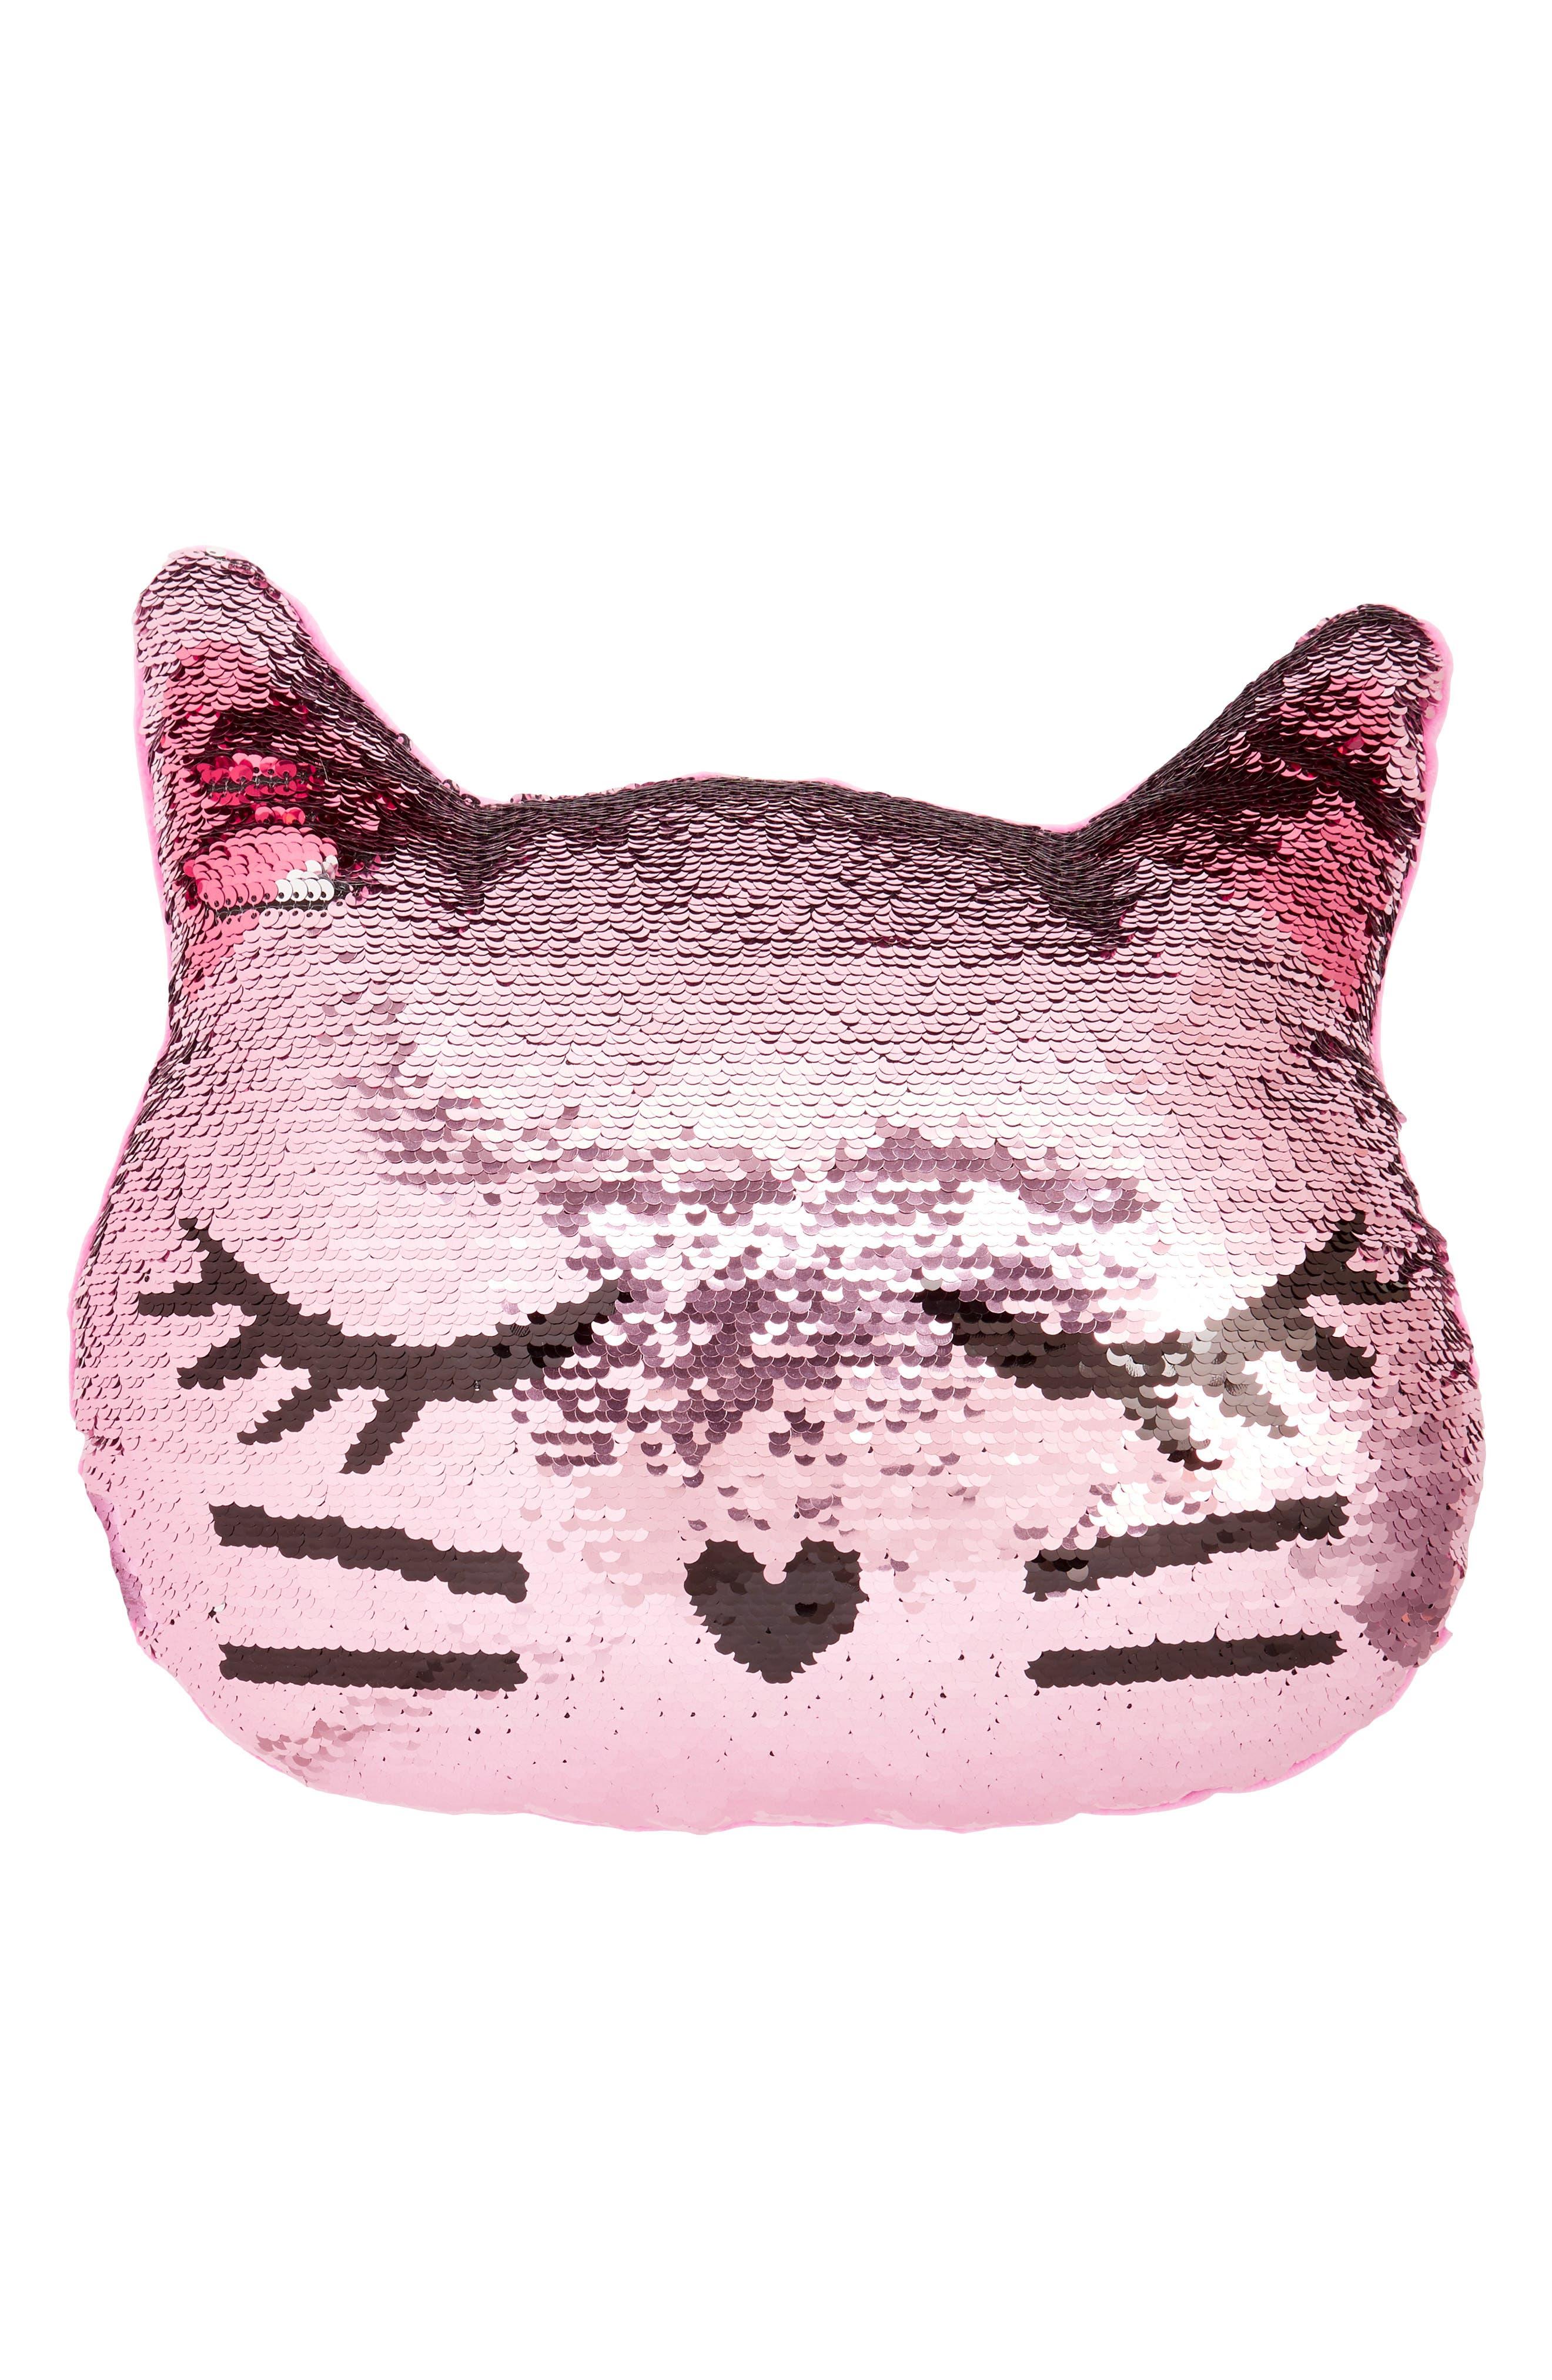 Reversible Sequin Cat Pillow,                             Main thumbnail 1, color,                             Silver Combo